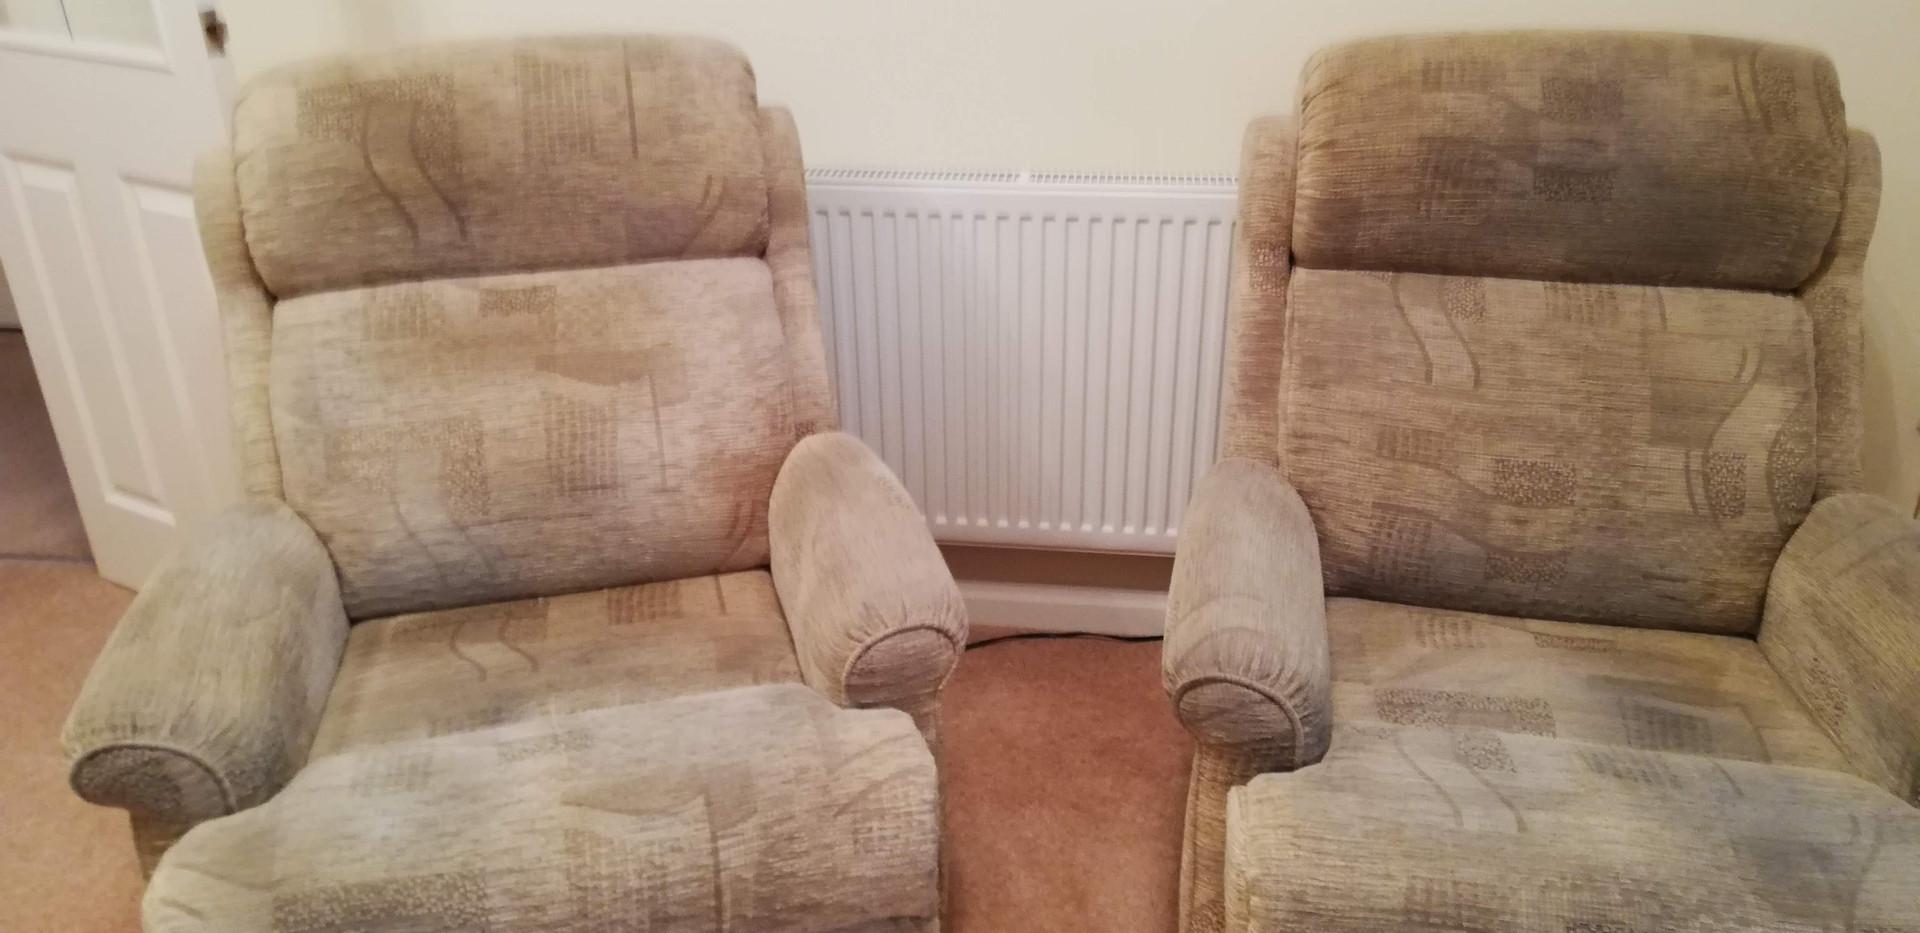 Upholstery cleaning Irthlingborough